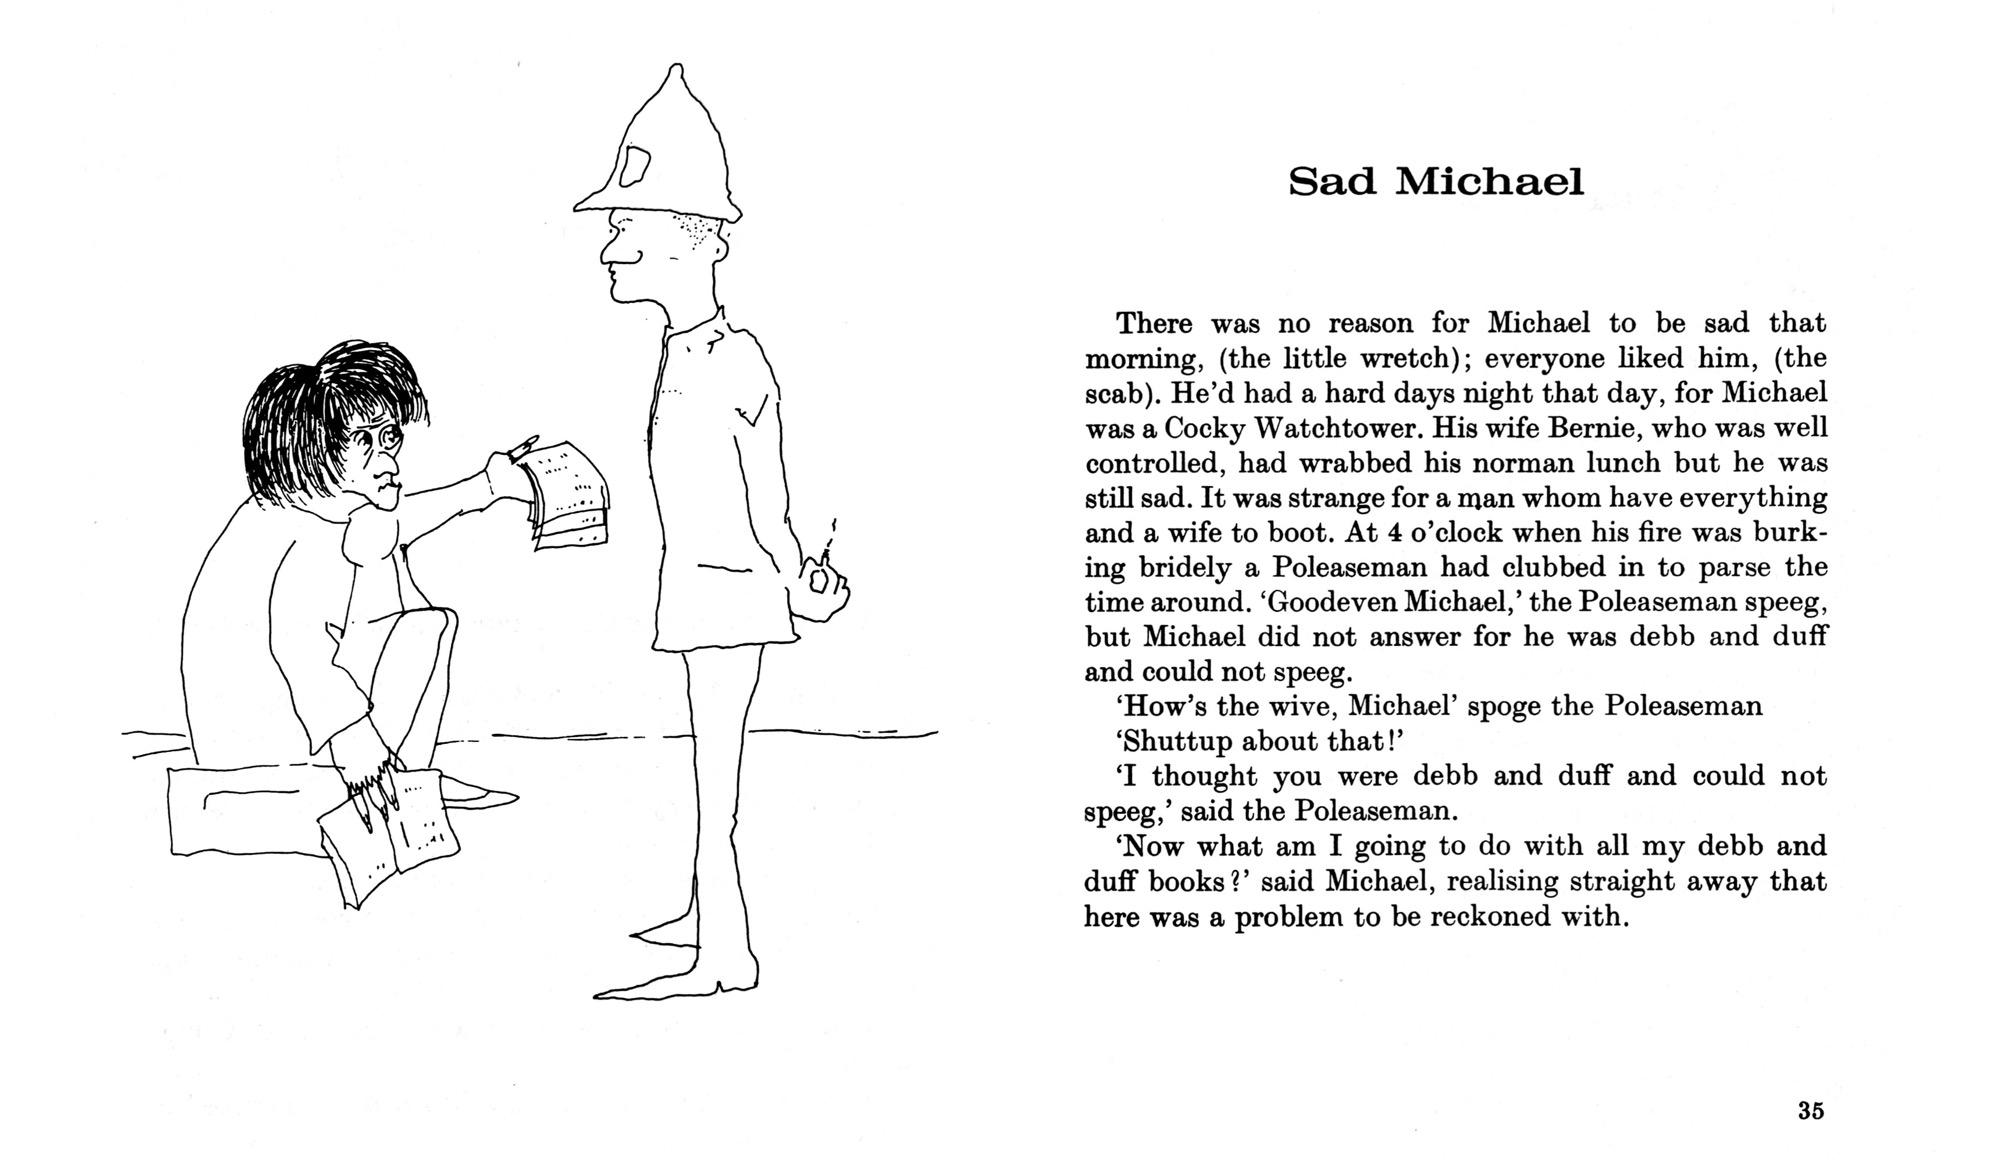 Sad Michael